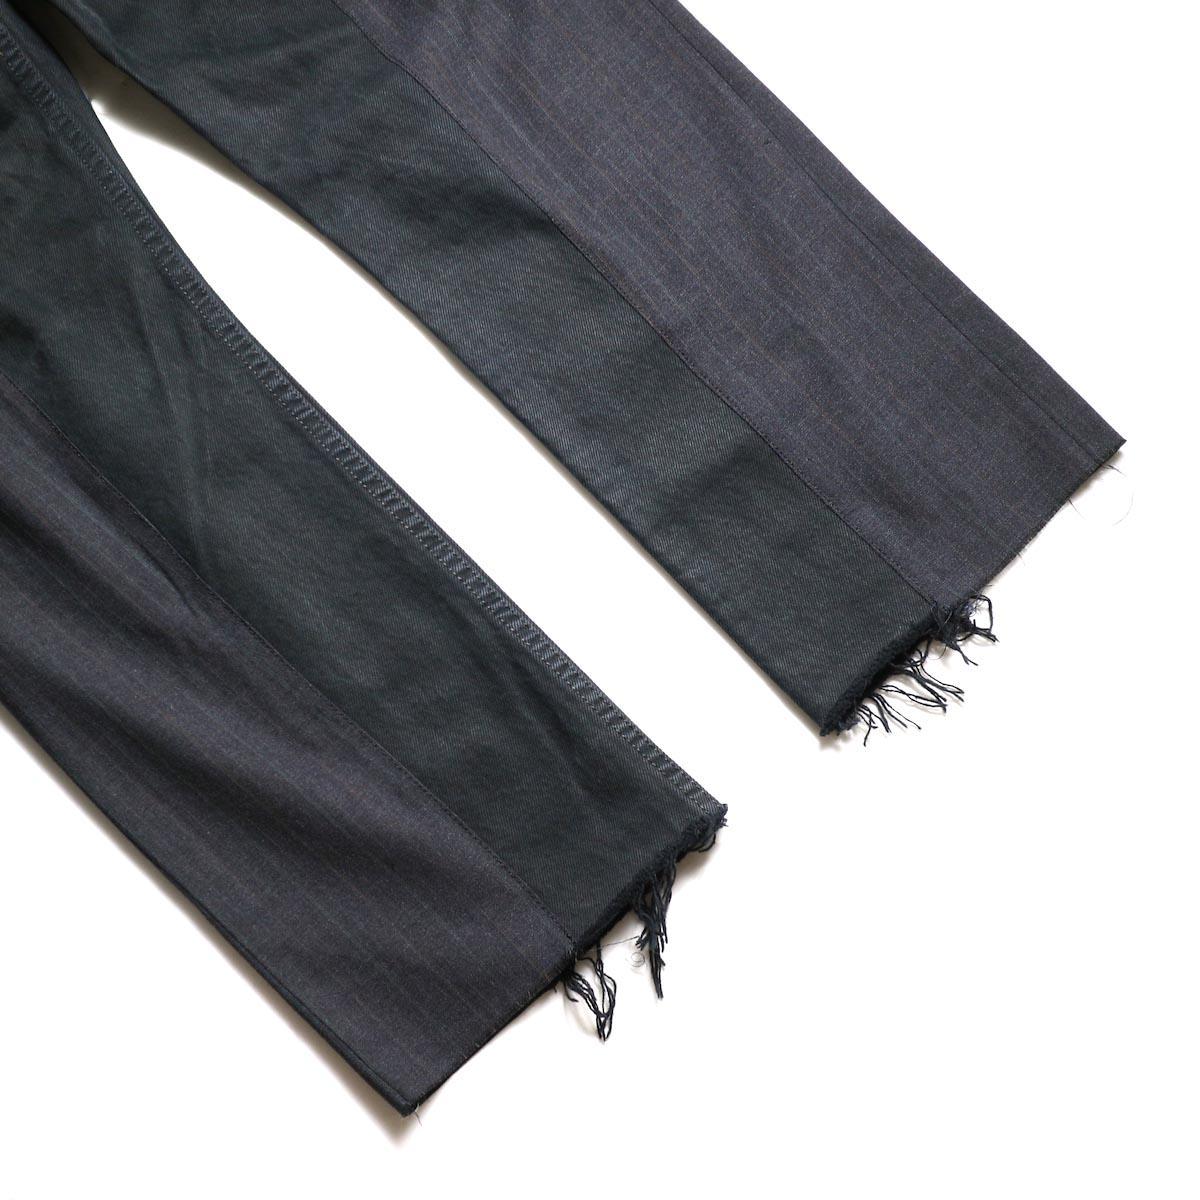 OLD PARK / Docking Jeans Black (Msize-A)裾